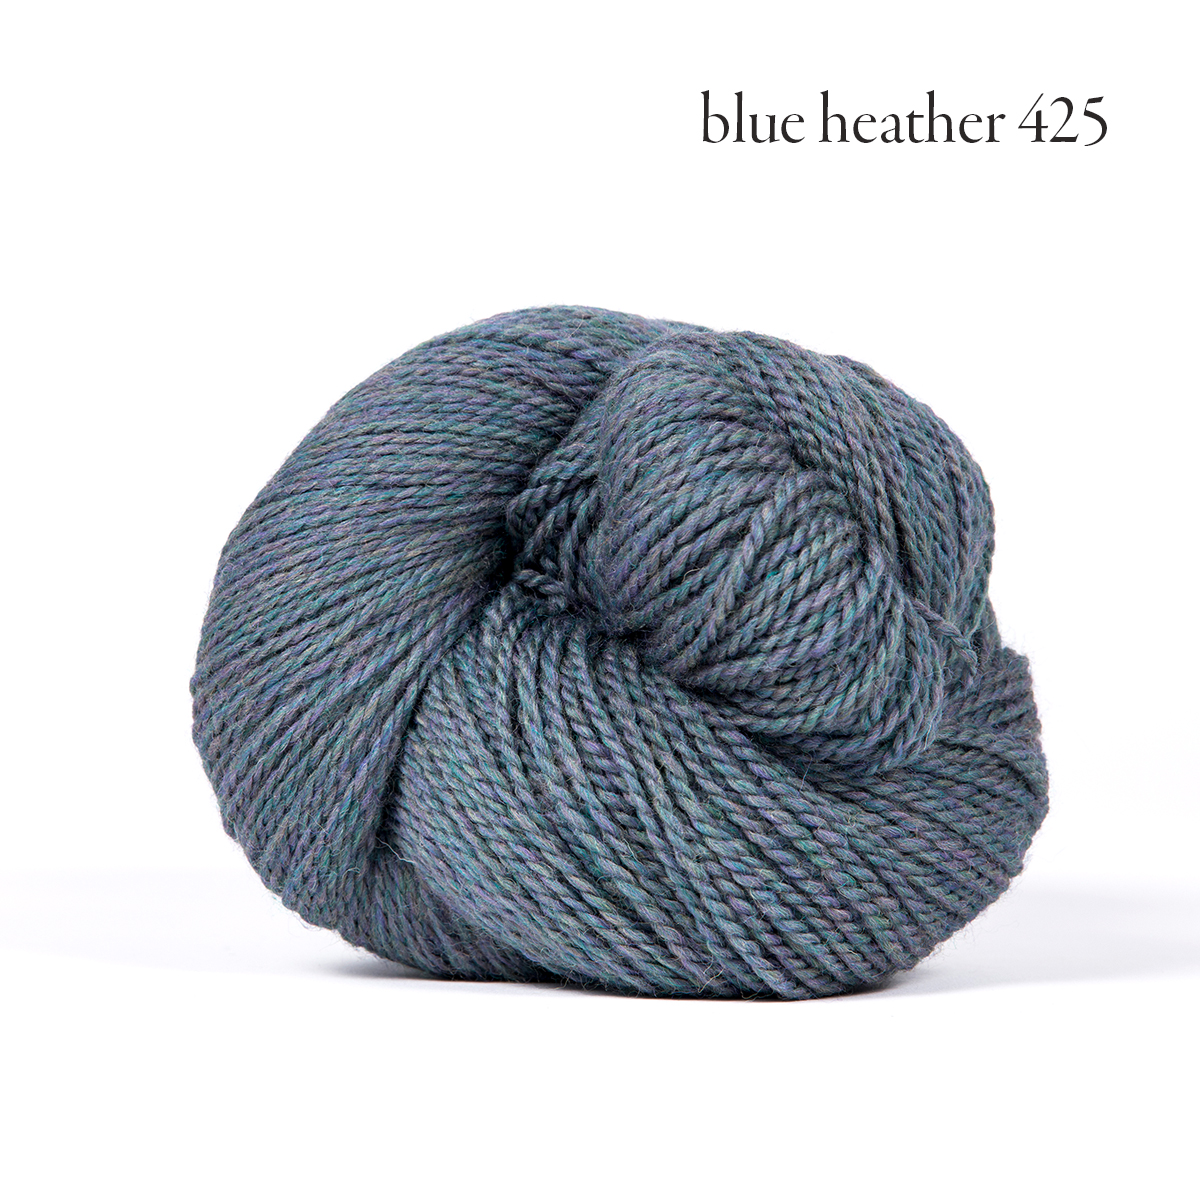 blue heather 425.jpg